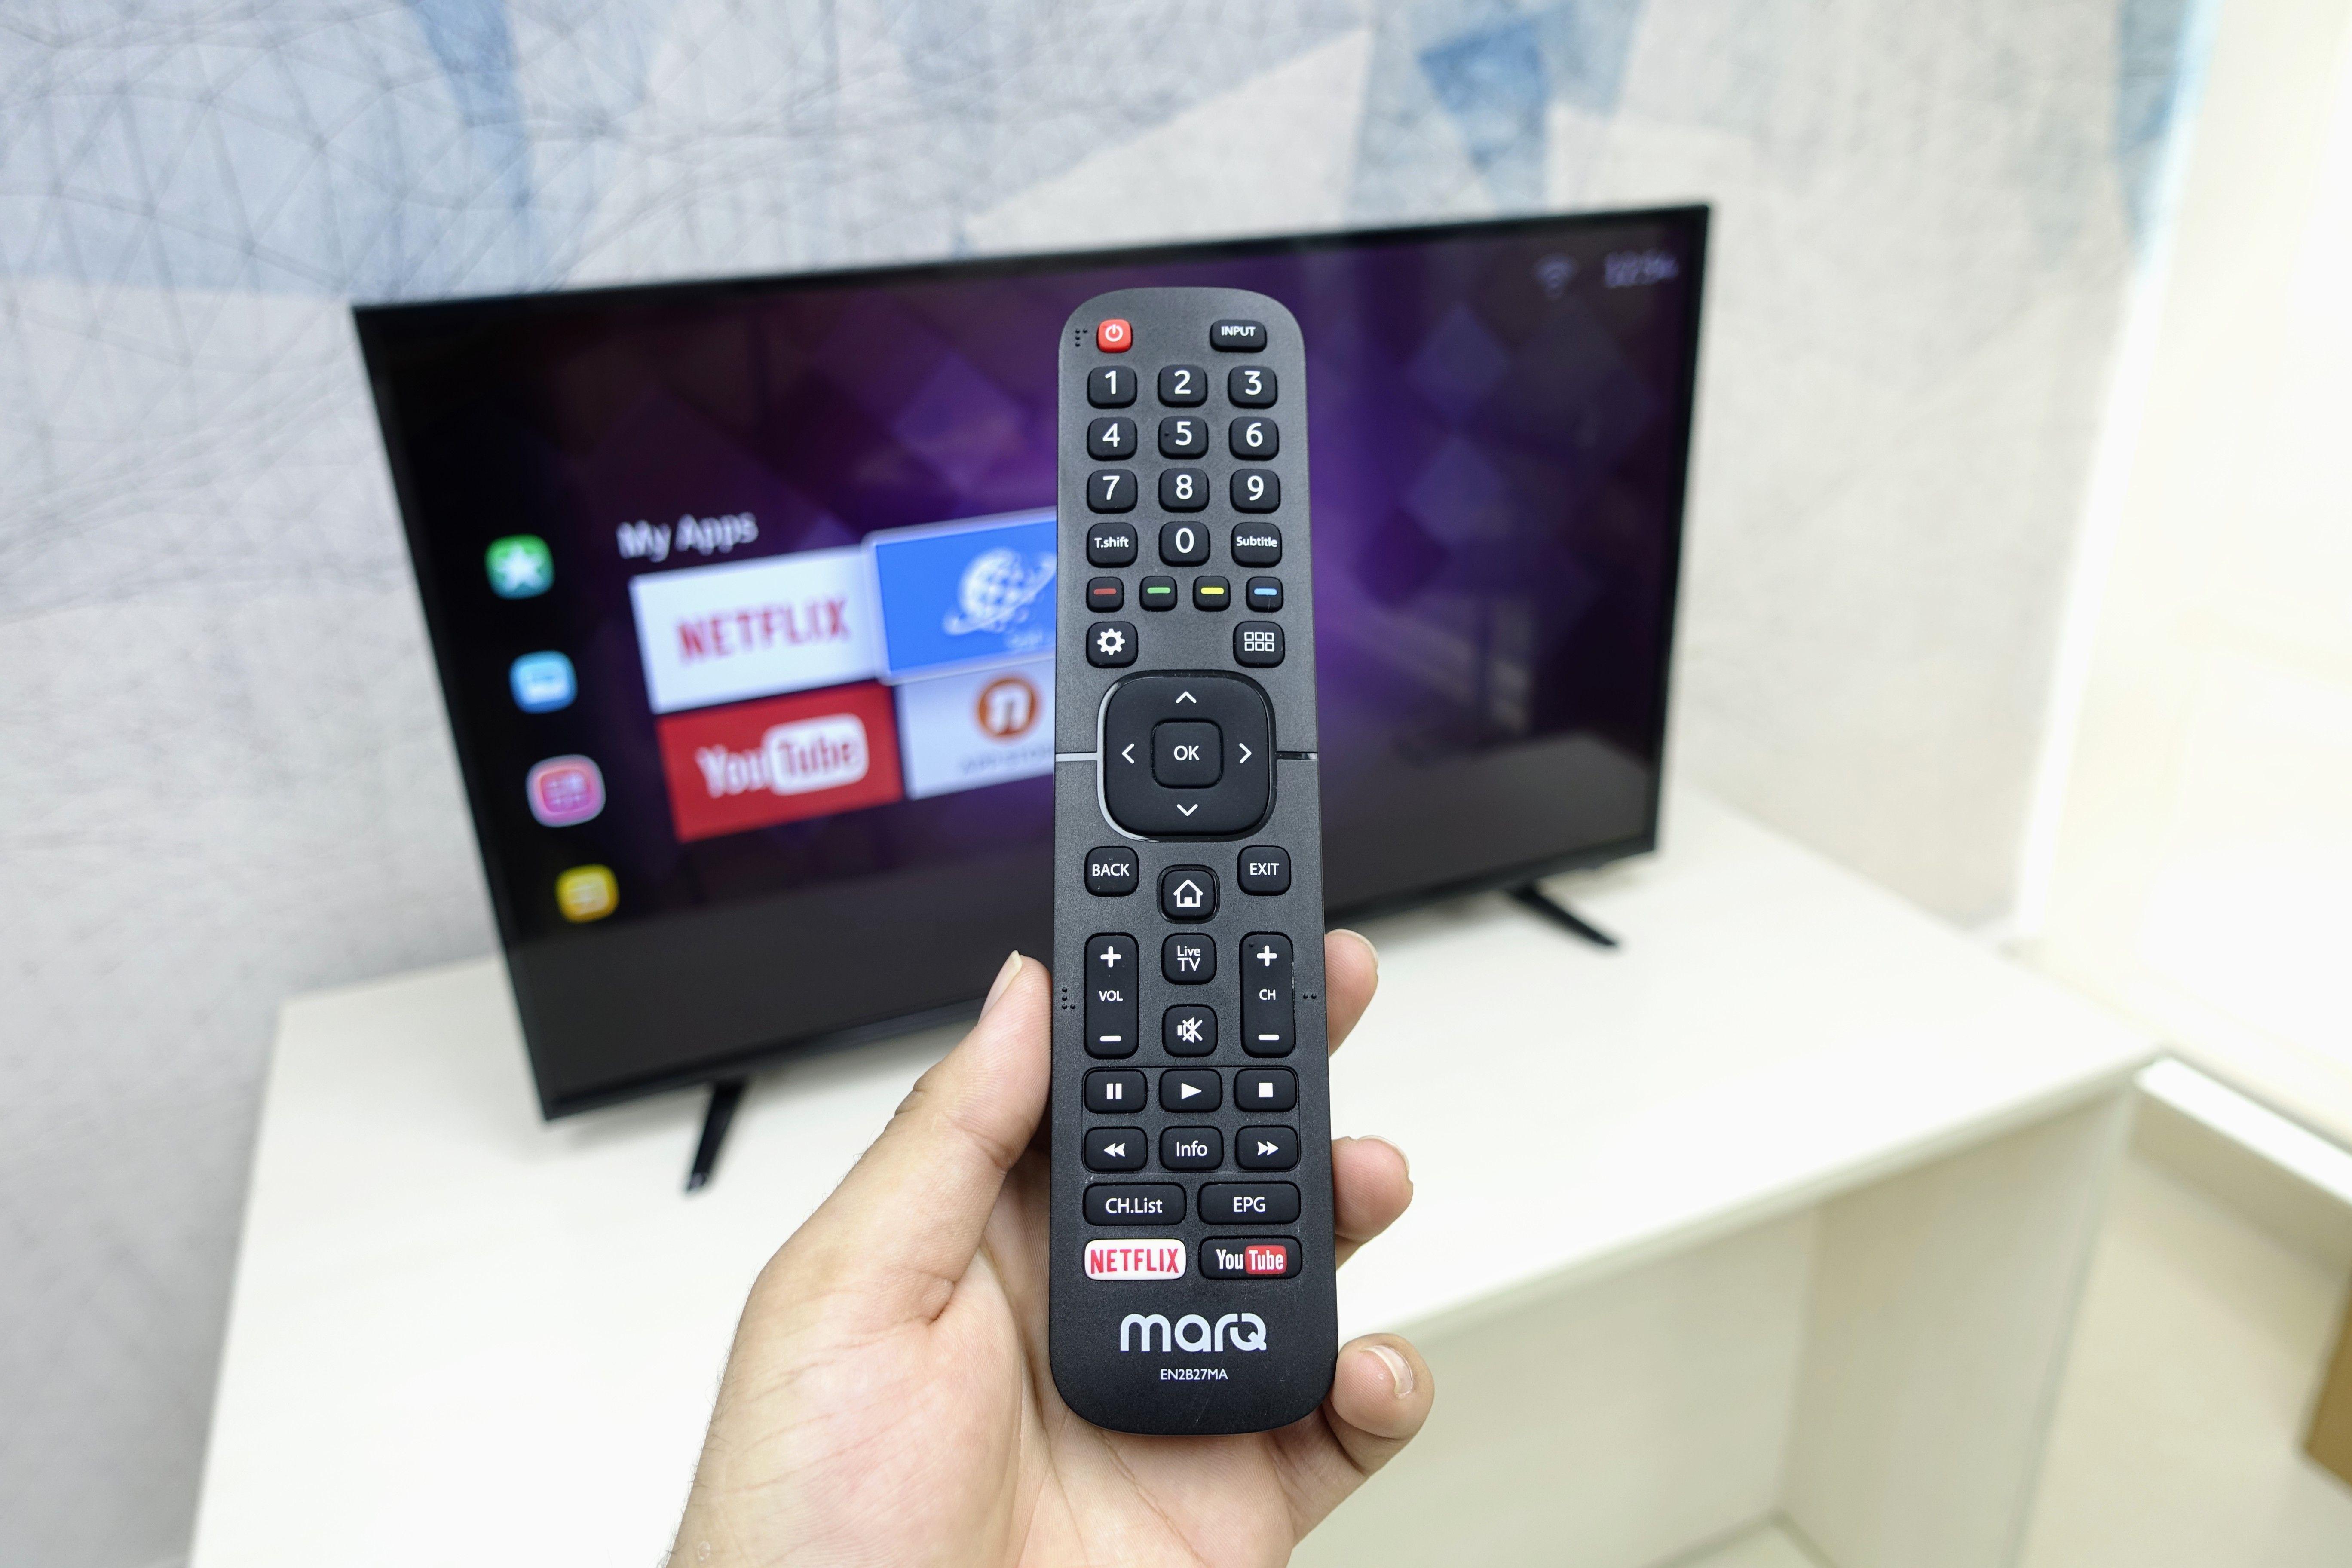 Flipkart Big Diwali Sale: Xiaomi Mi LED TV 4A, Vu Official Android, Thomson B9 Pro Smart TVs on Offer